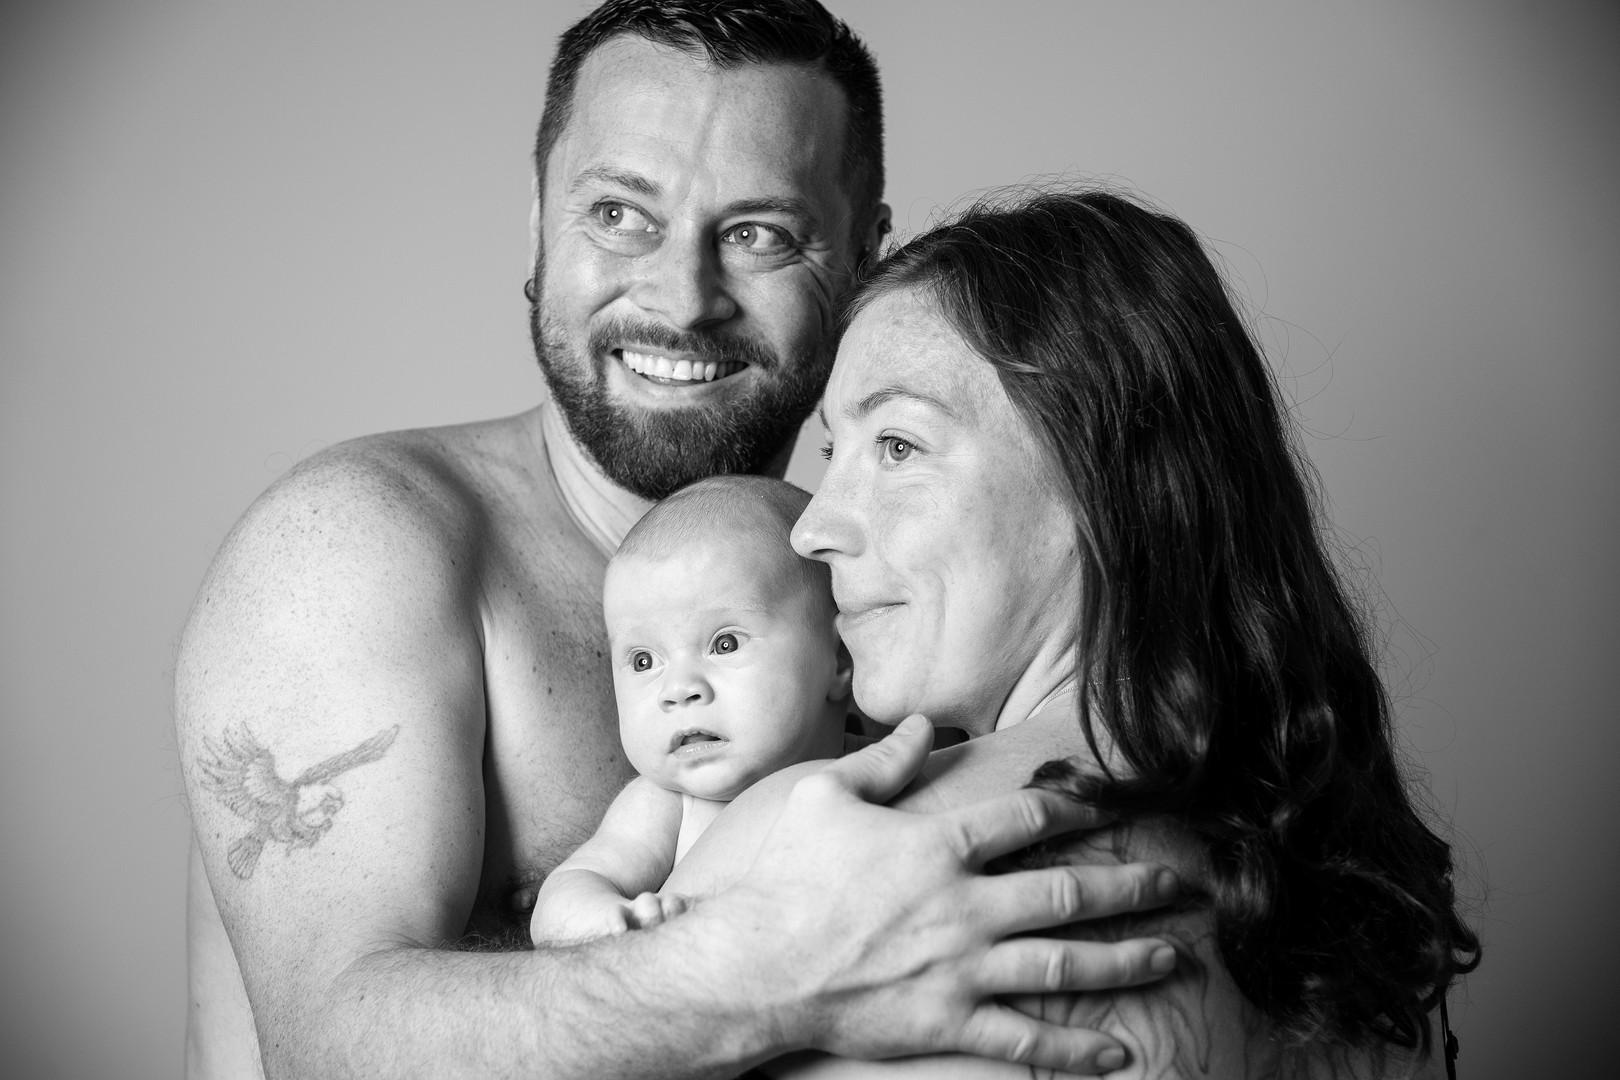 Neugeborenenfotografie Neugeborenenfoto Newbornshooting Babyfoto Familienfoto Familienbild Studiofot Nürnberg Bamberg Forchheim Höchstadt Erlangen Gräfenberg Two Hearts Fotografie.jpg